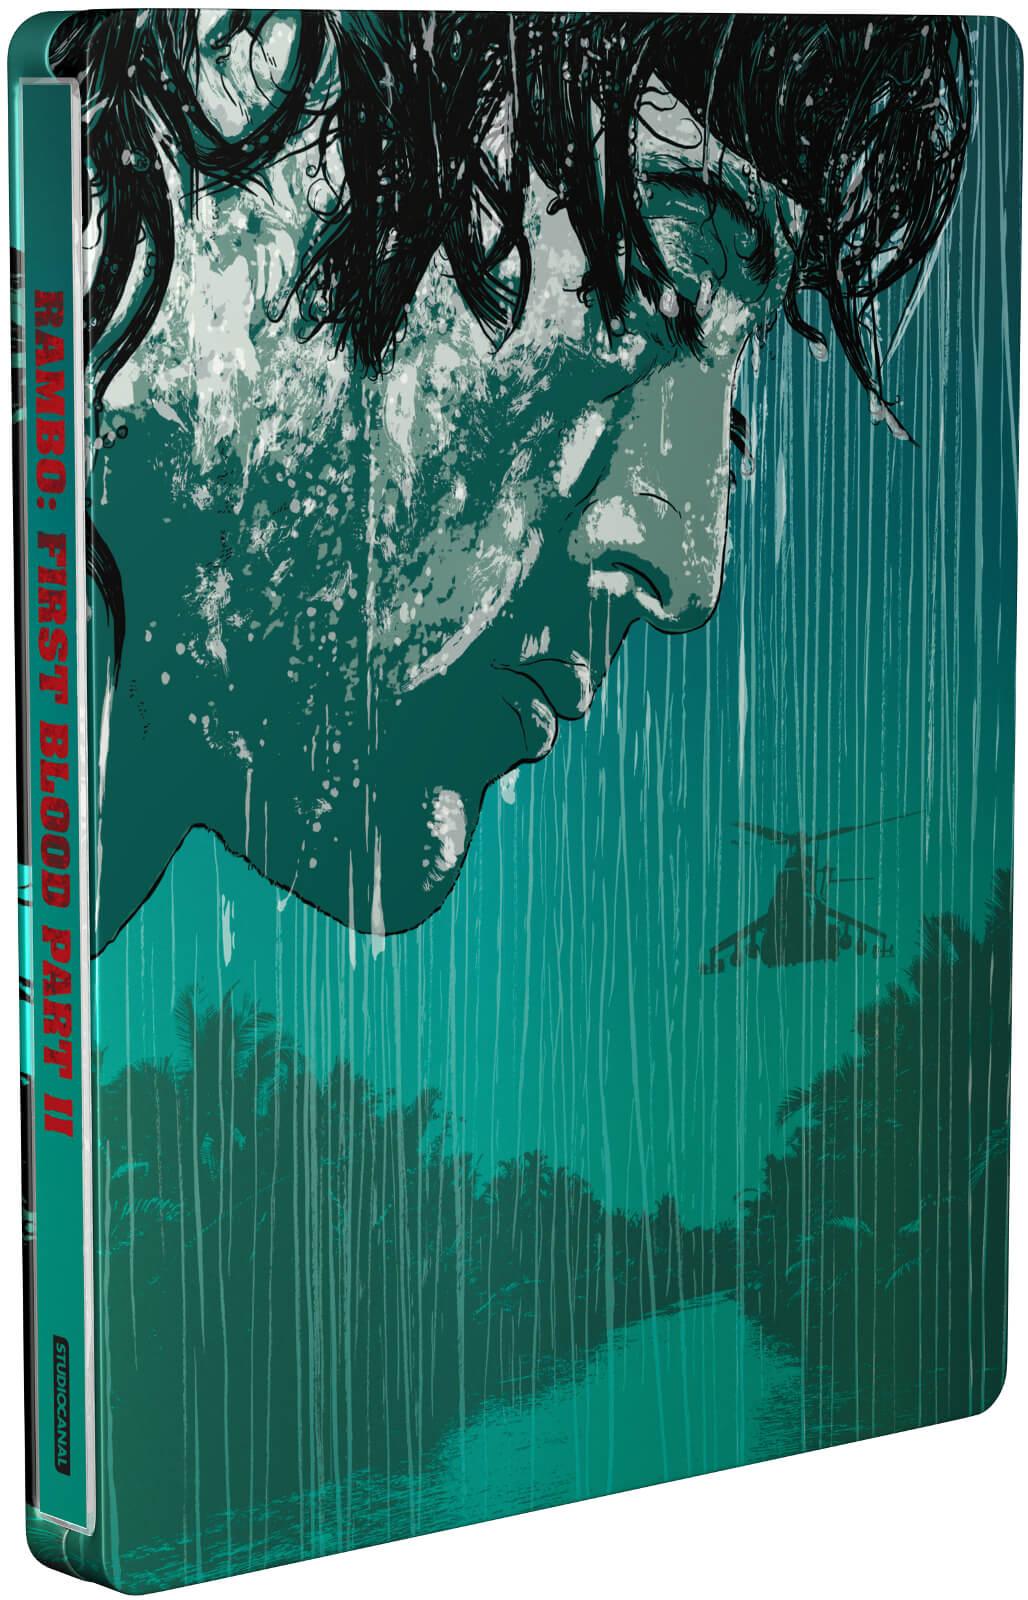 Rambo: First Blood Part II SteelBook front